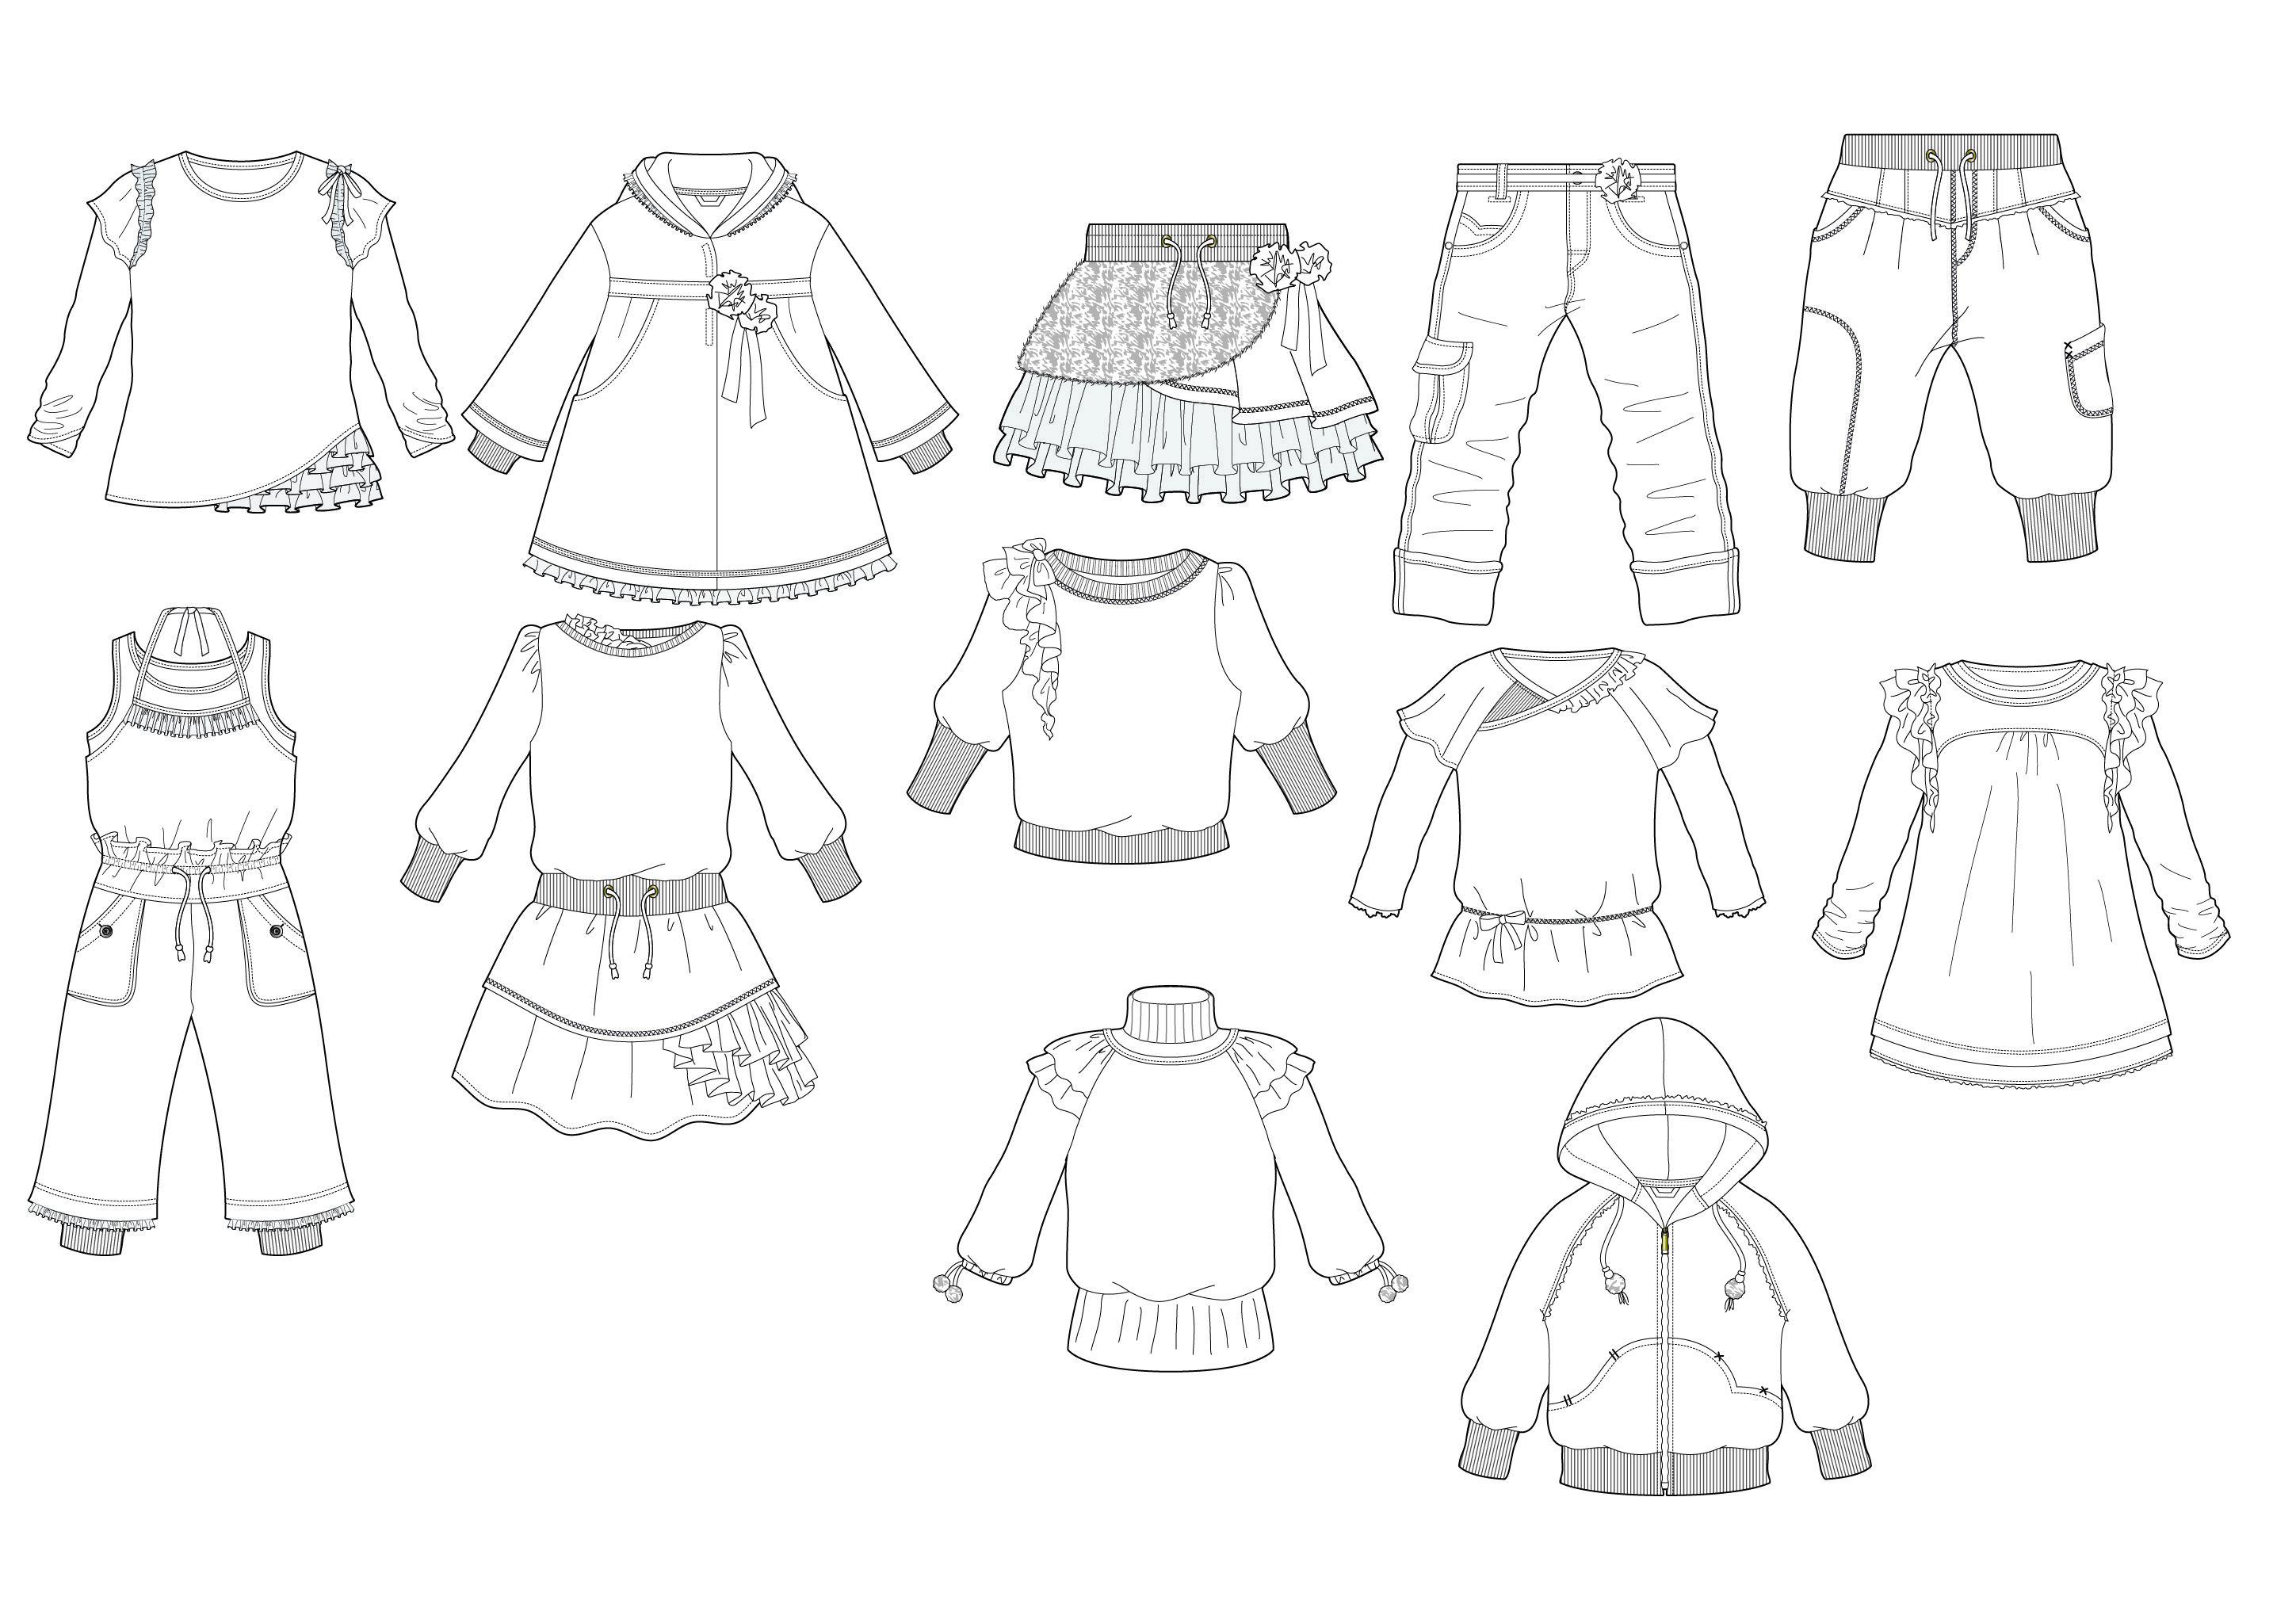 Printable Clothes Templates For Kids | Fashion Design Flat Sketches - Free Printable Fashion Model Templates